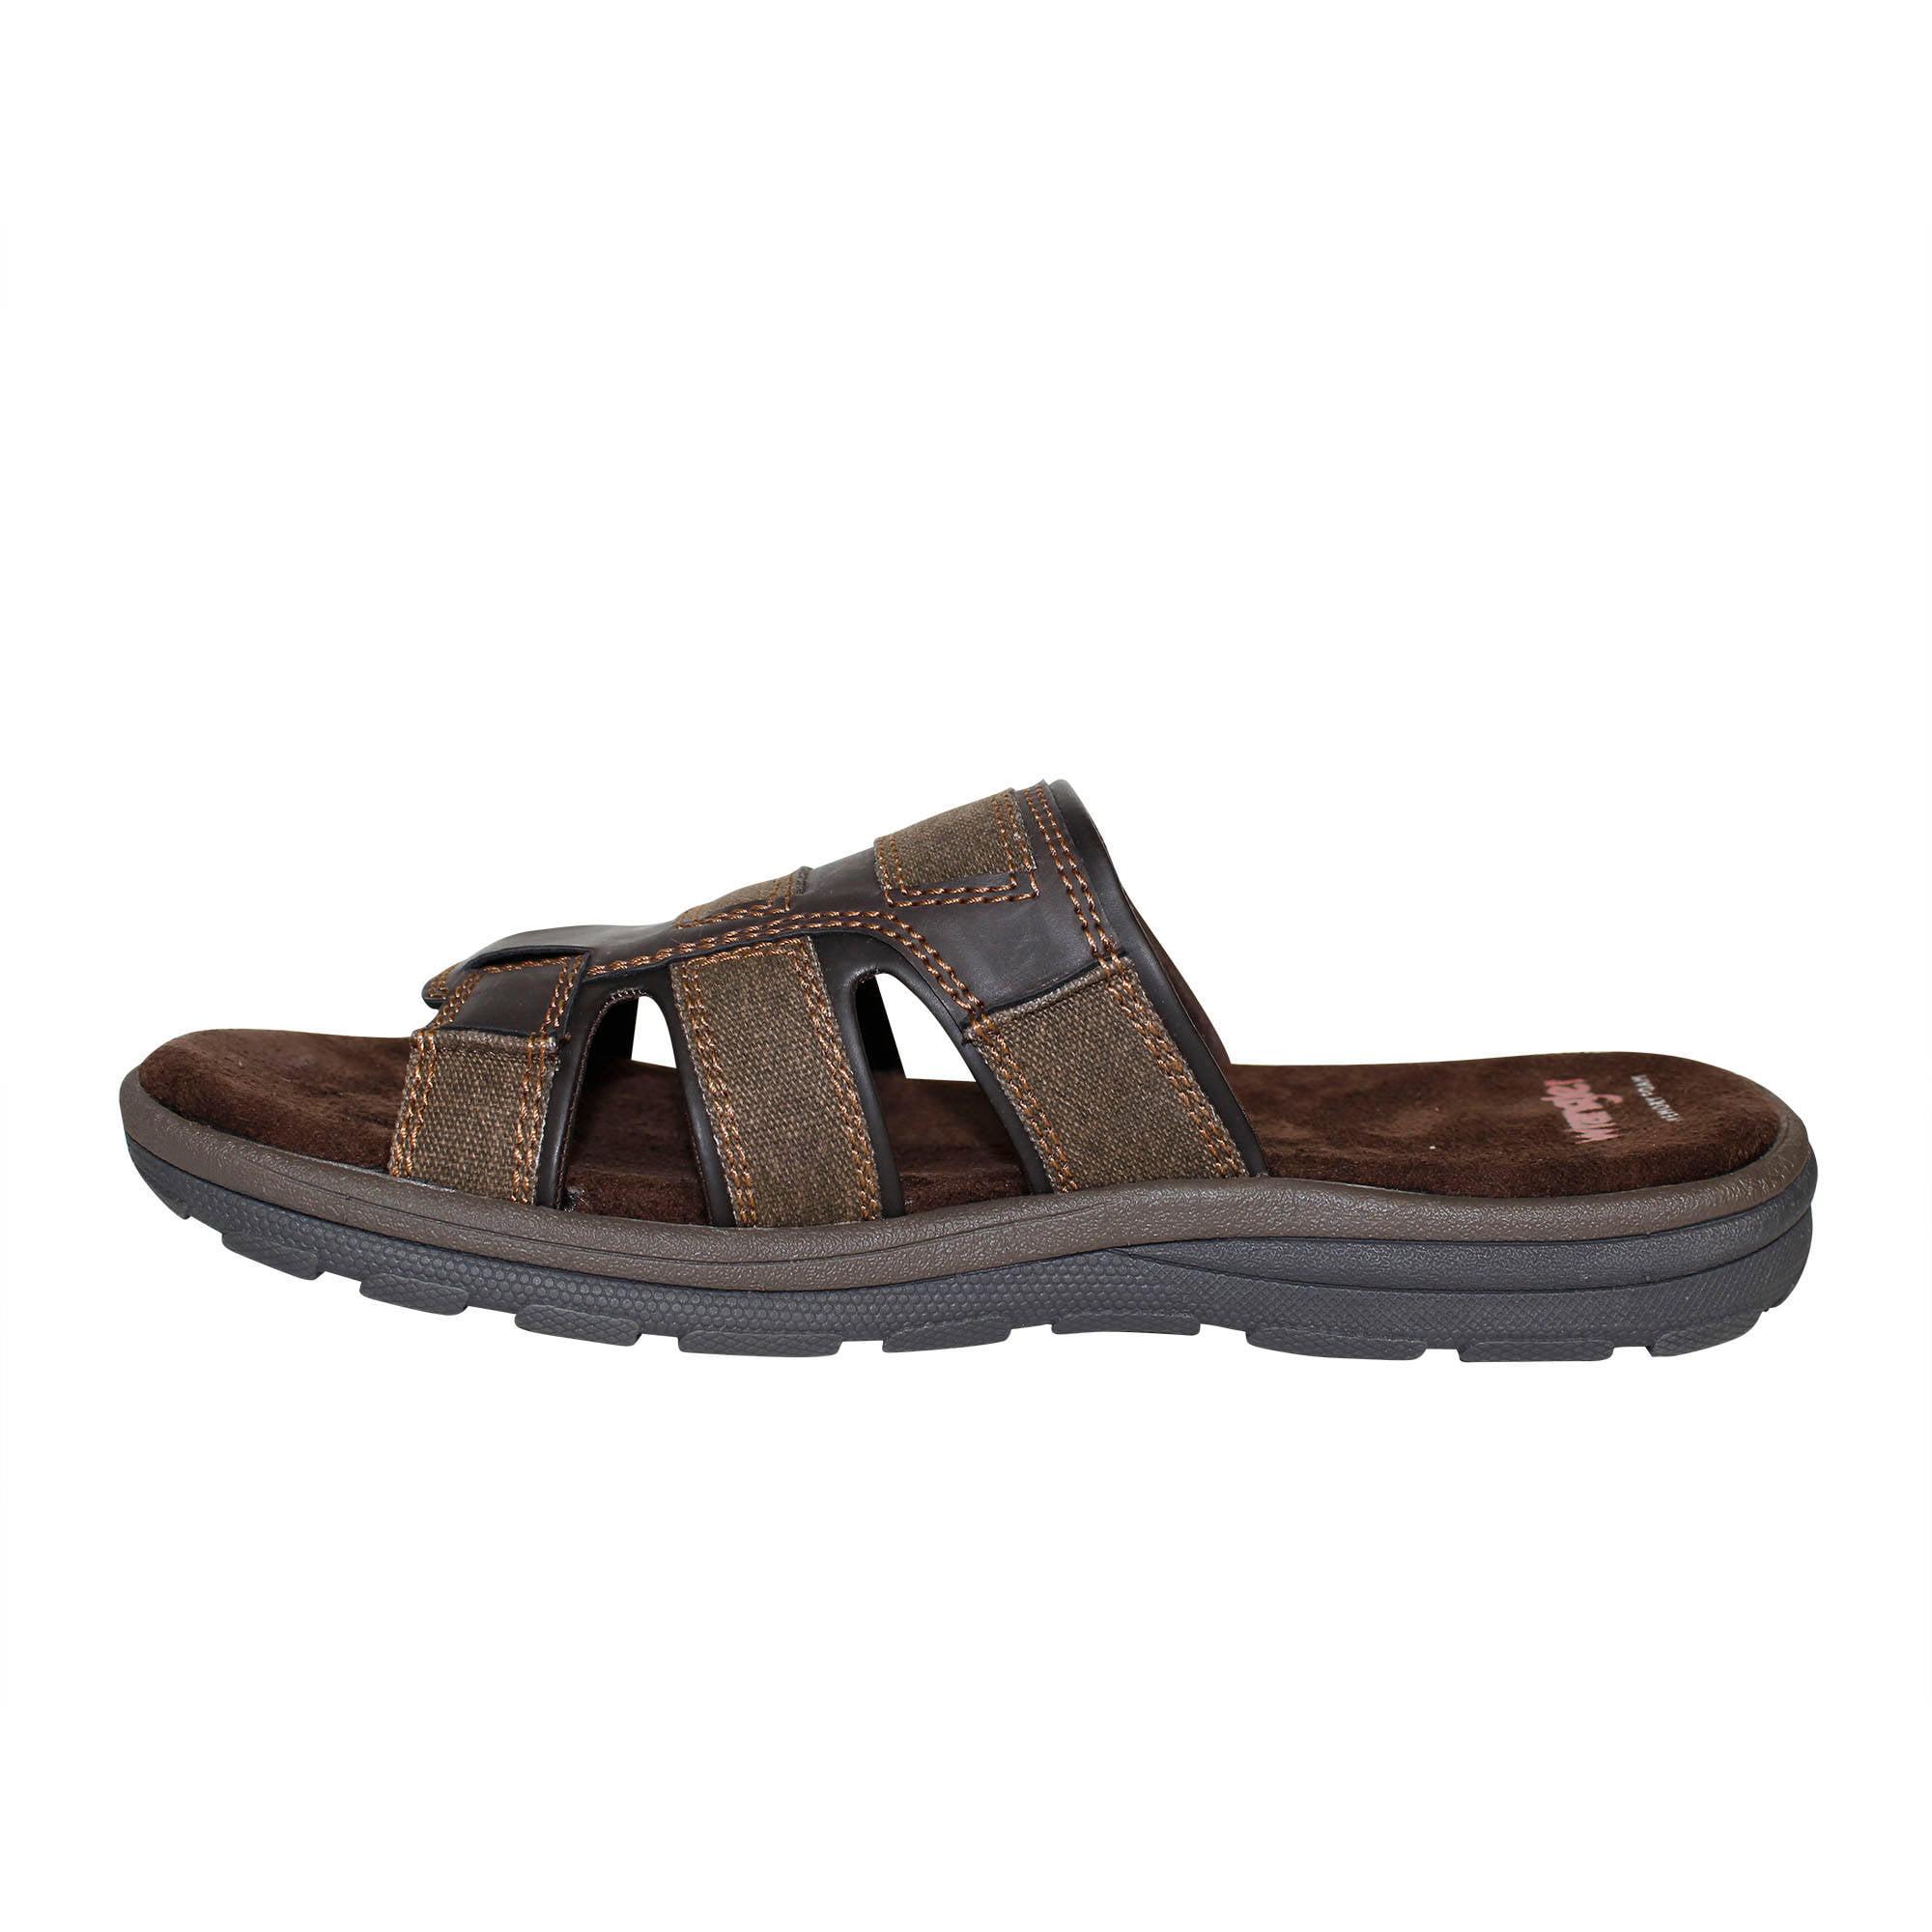 how to wear slip sandals for men